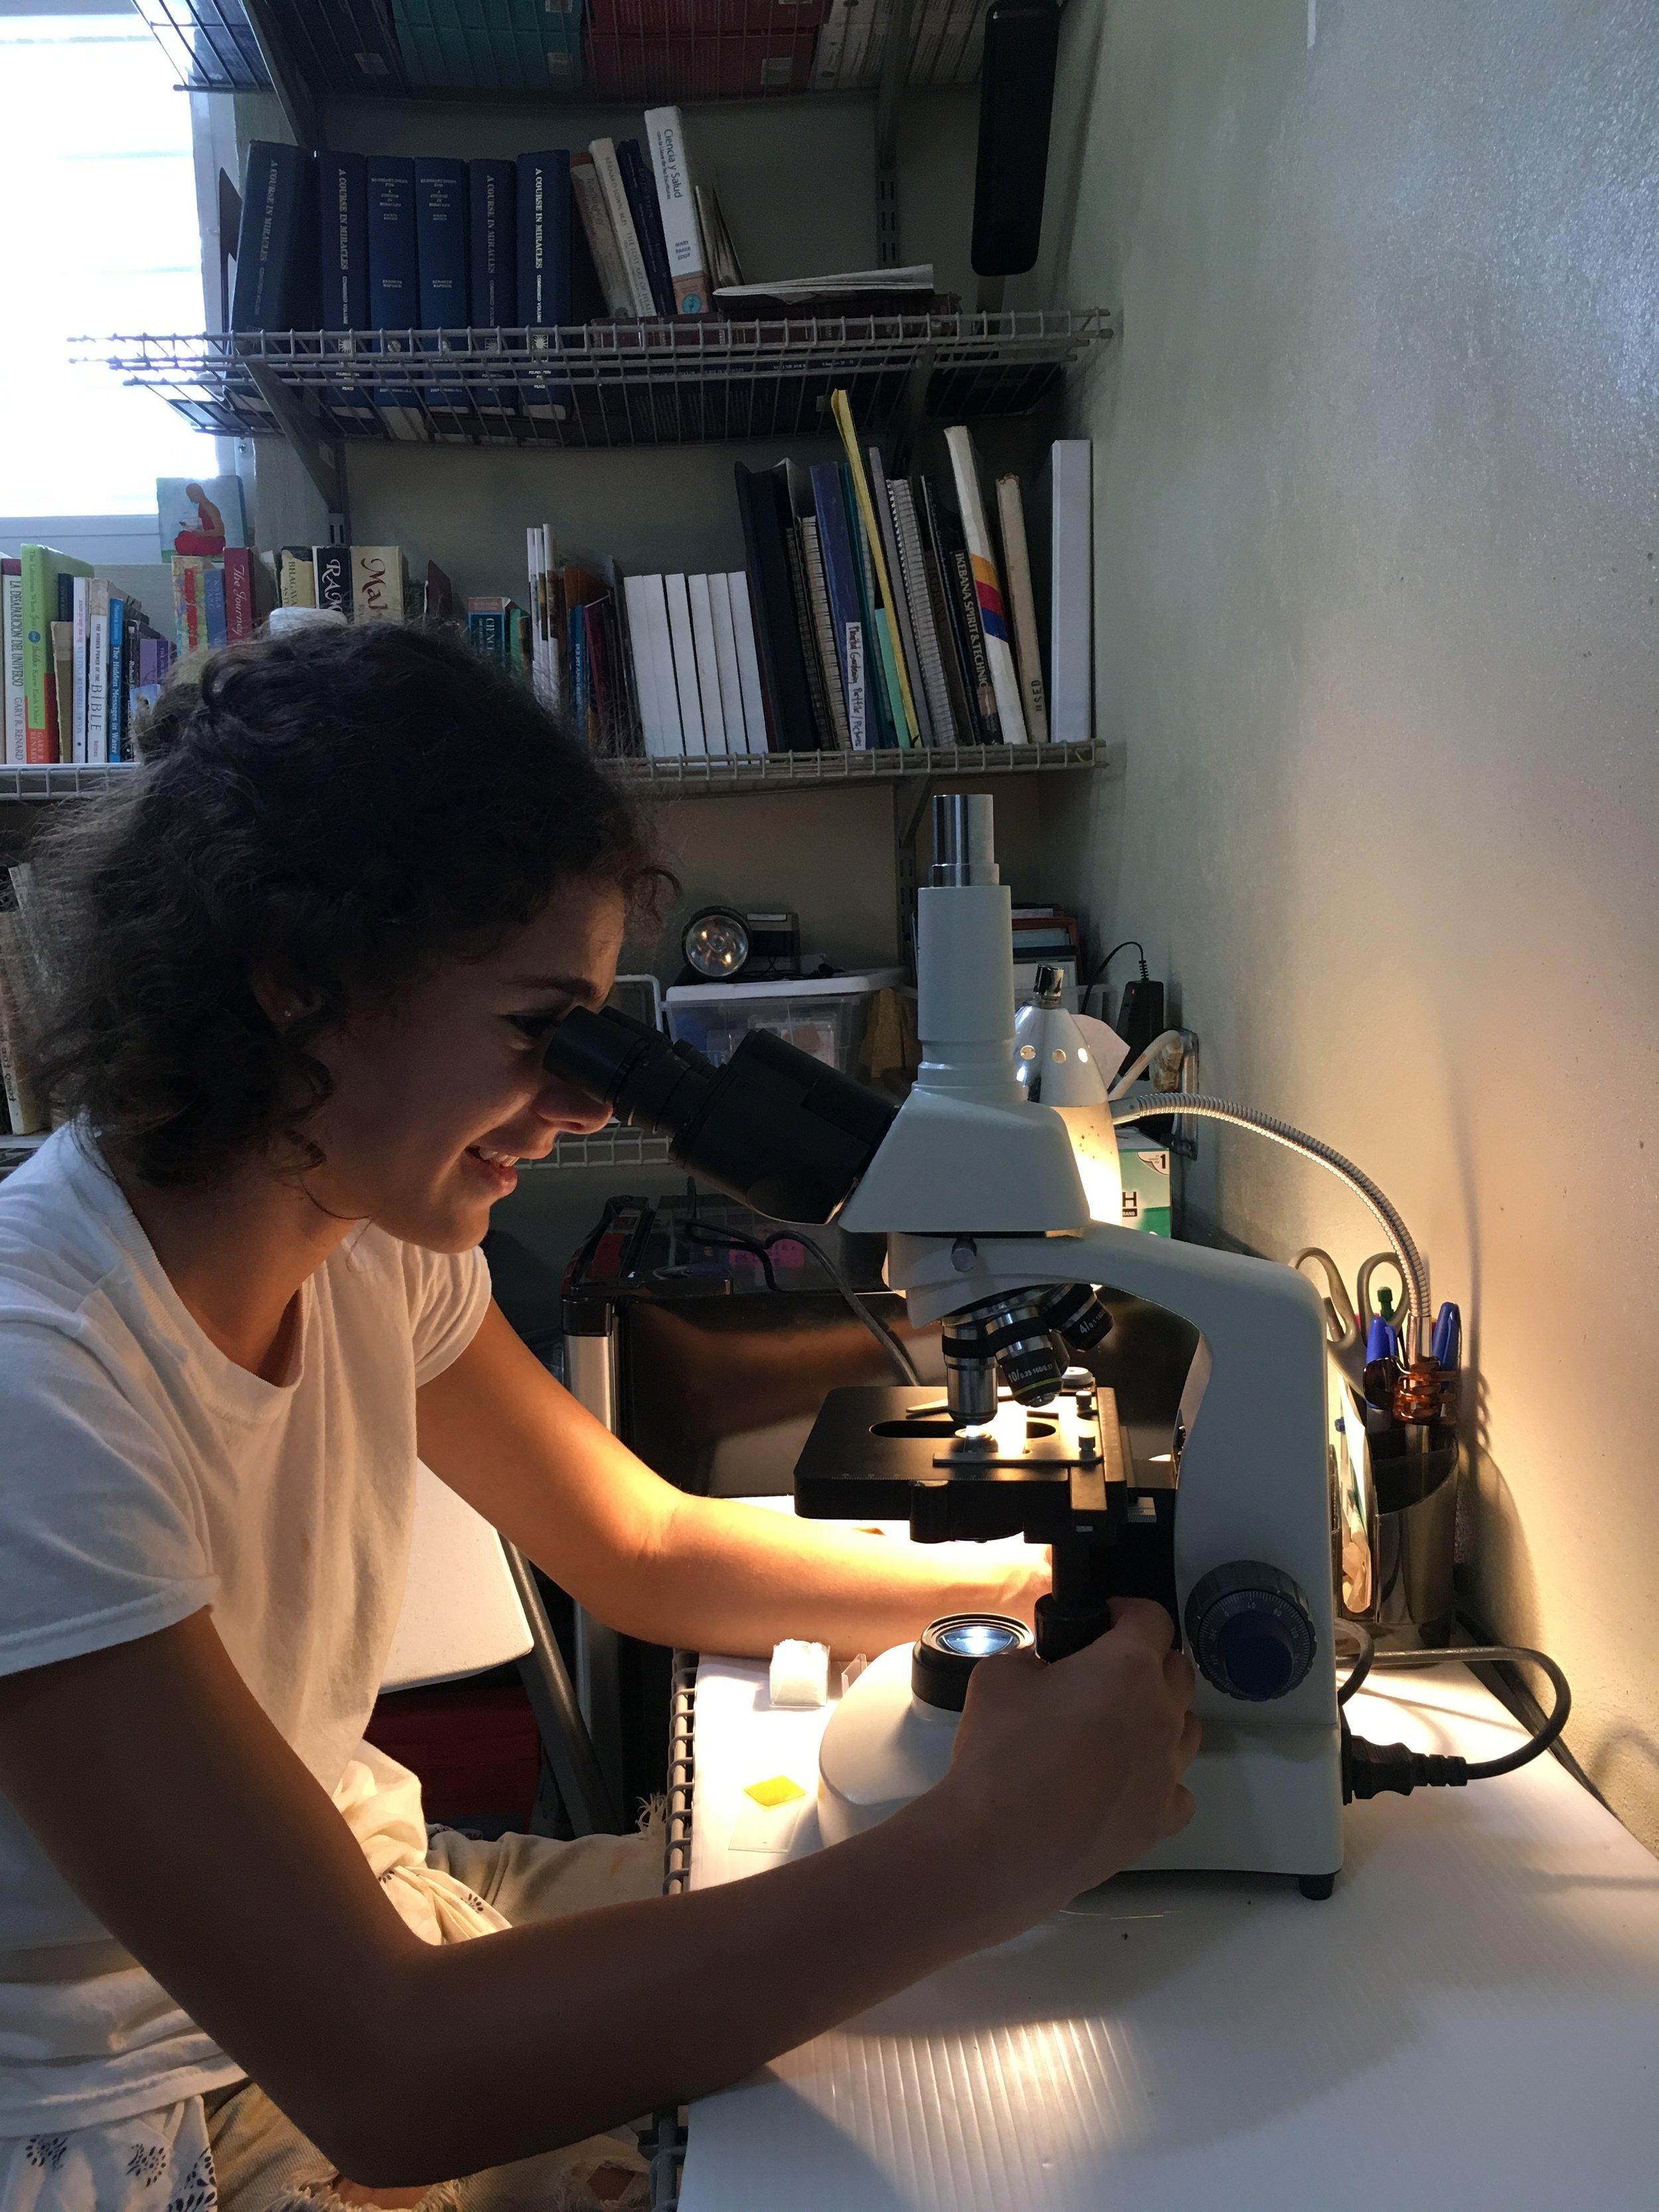 Alejandra, biology student, working on her practice at Plenitud